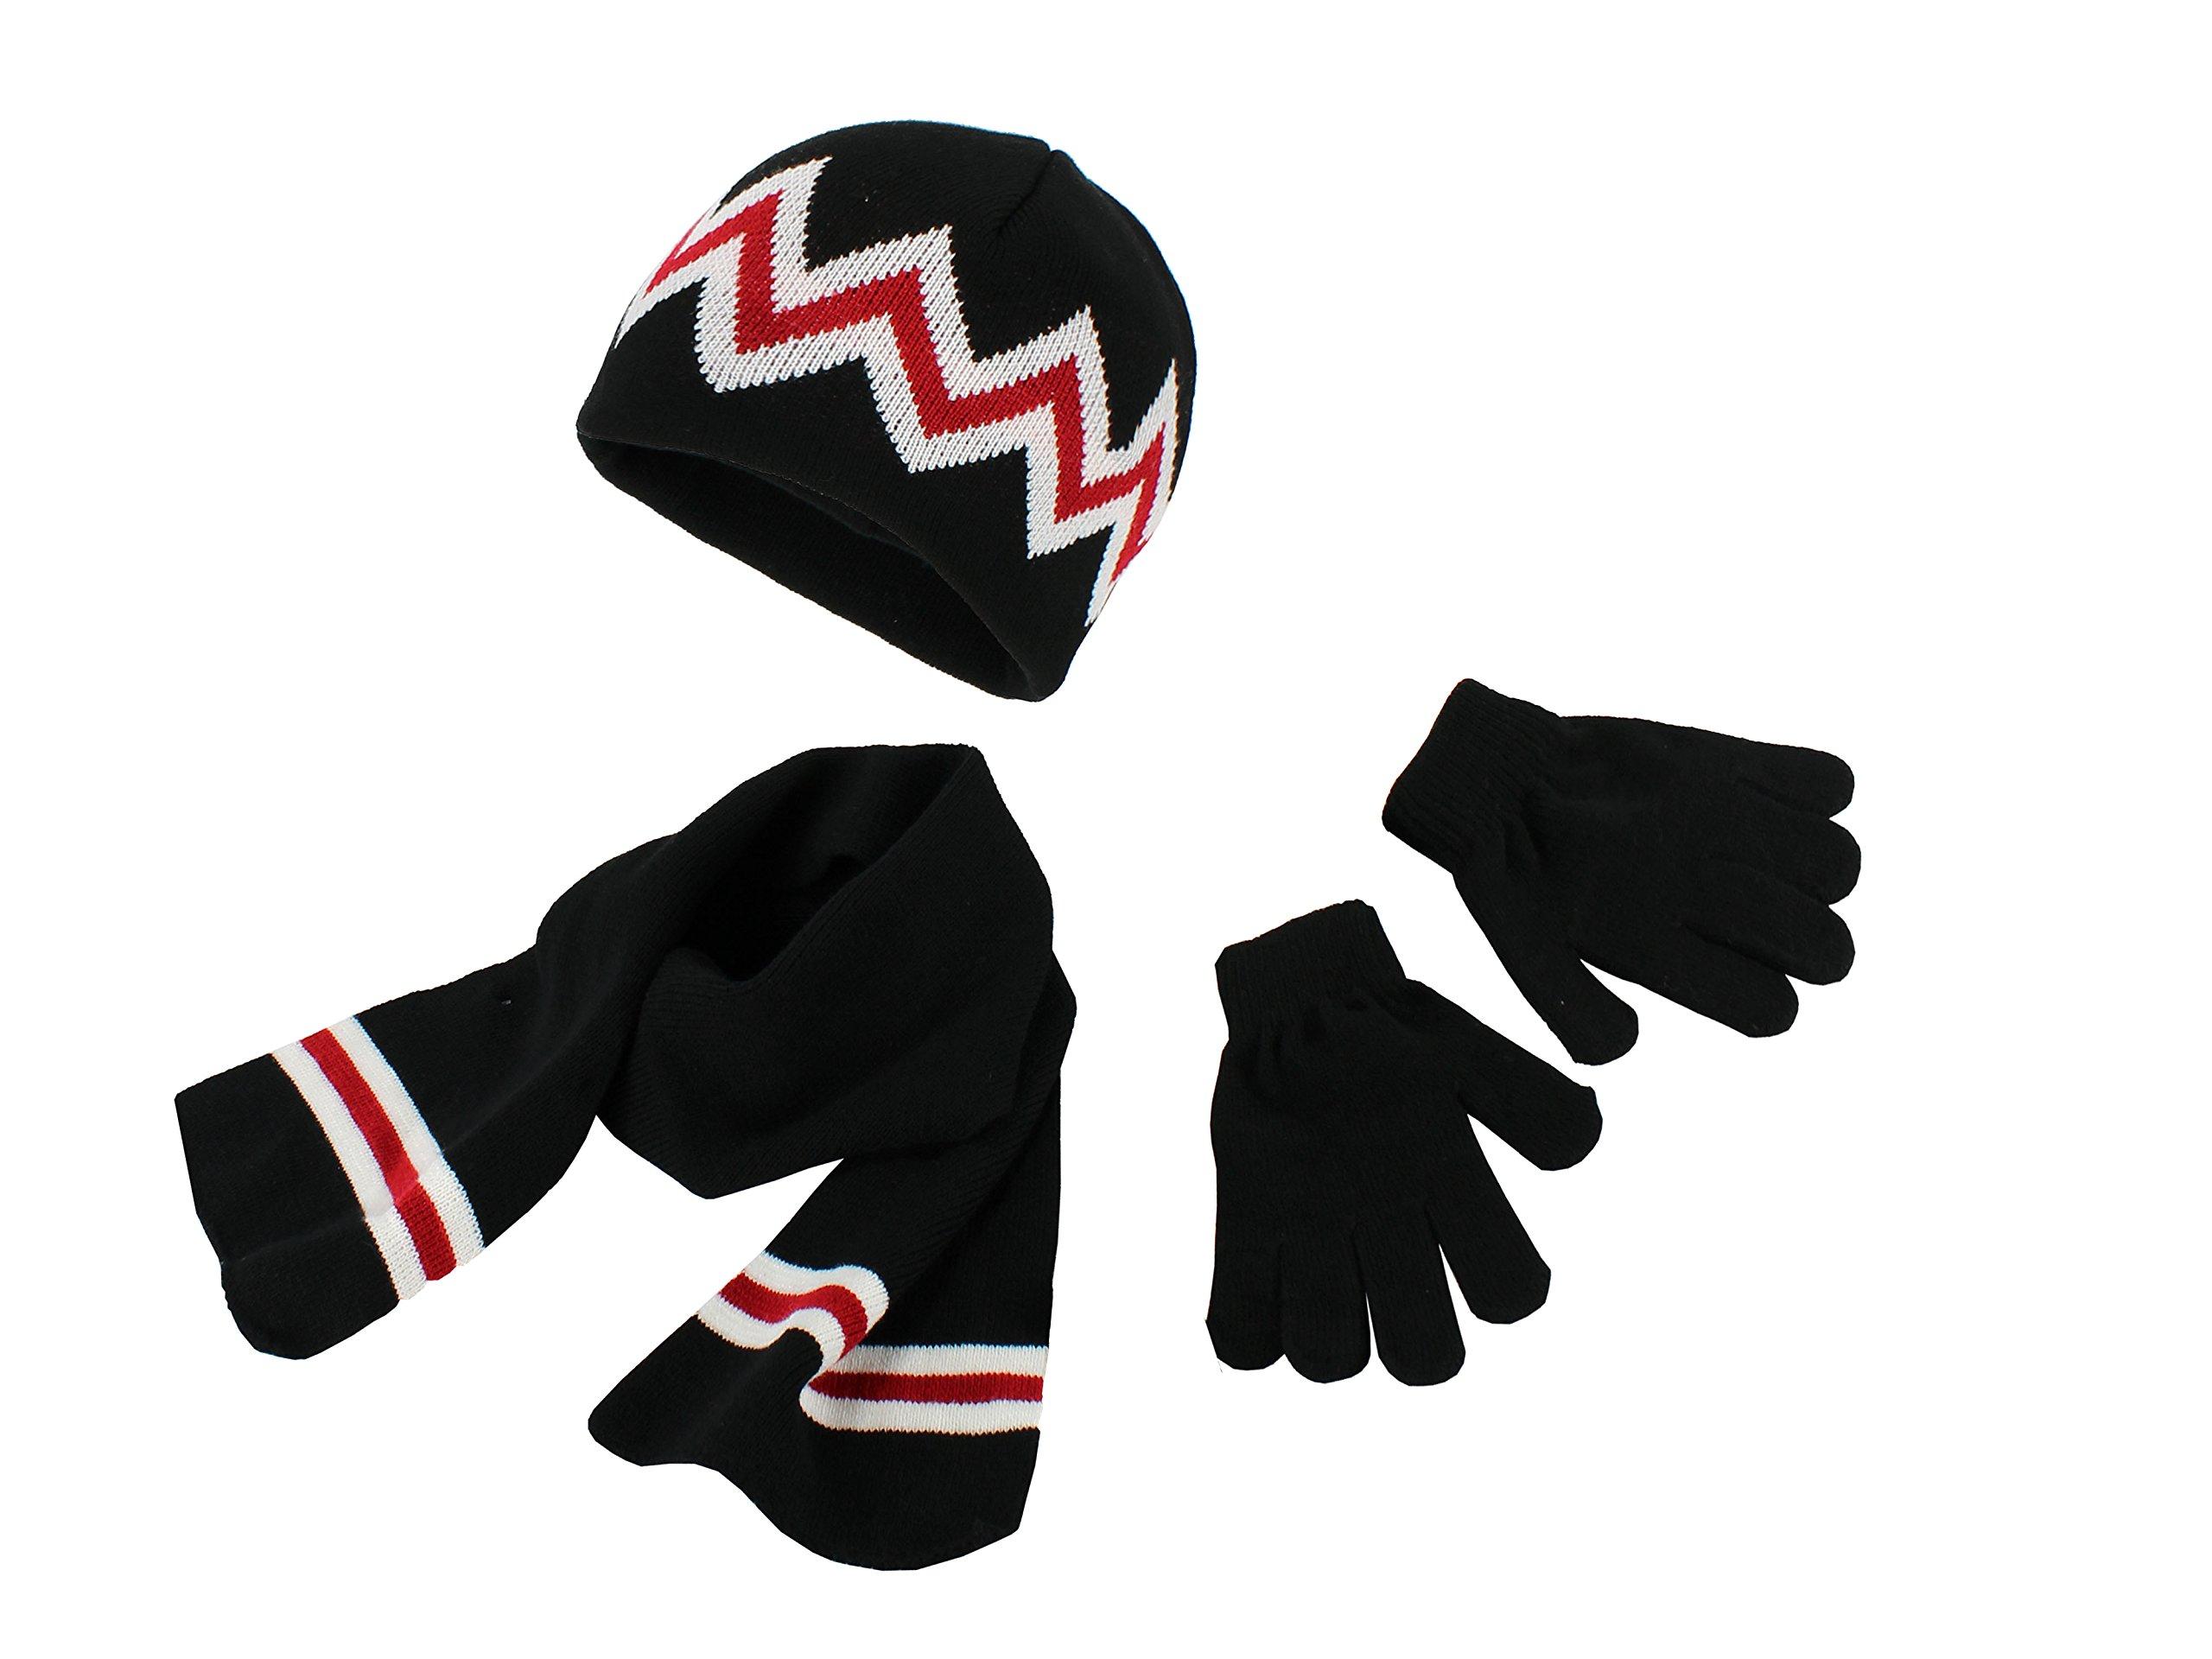 Polar Wear Boys Knit Hat, Scarf And Gloves Set - Black/Red